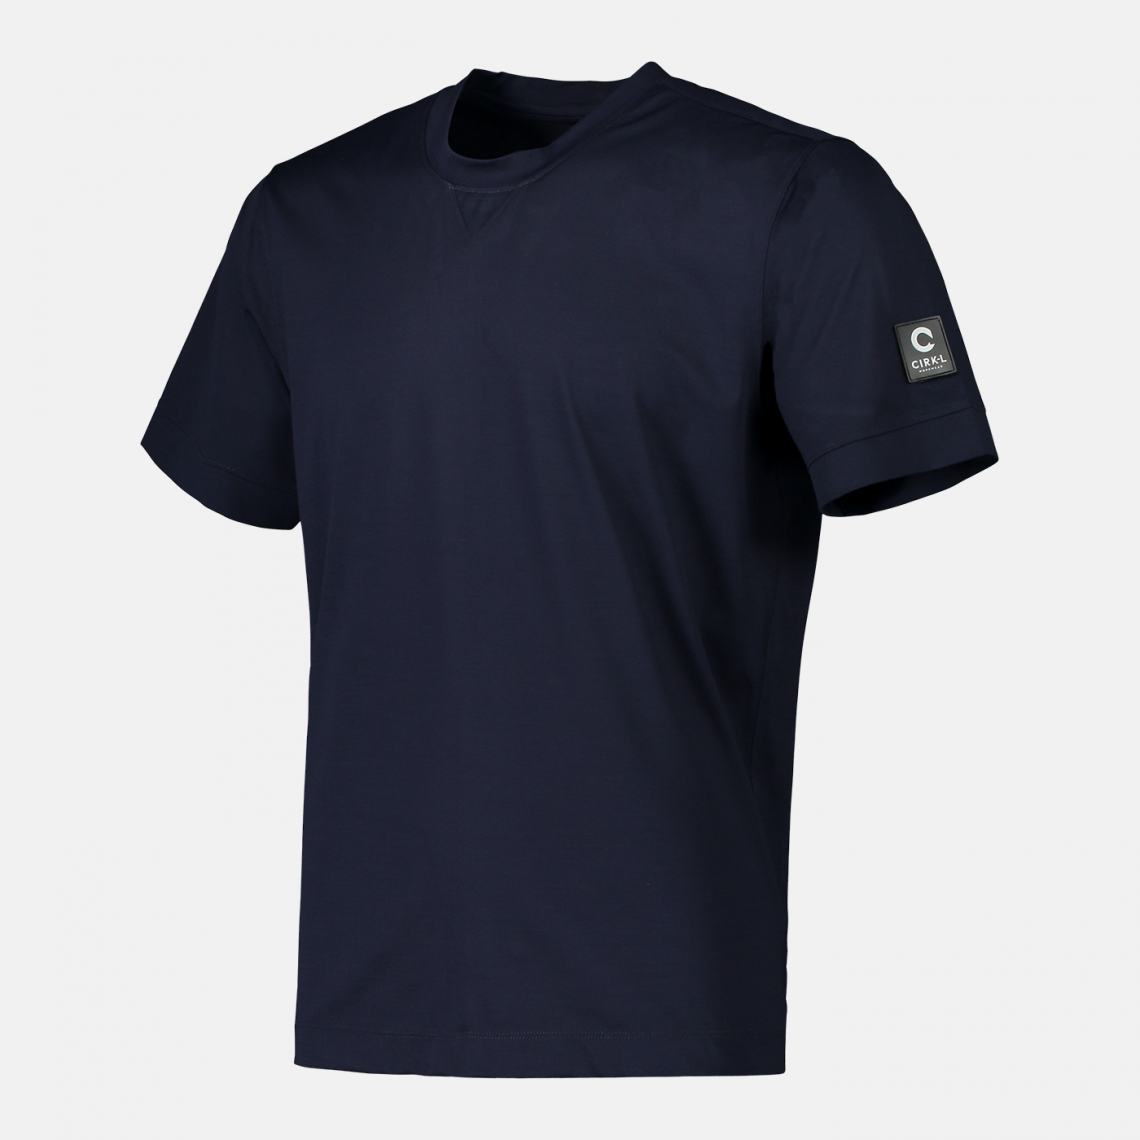 T-shirt, OEKO-TEX certifierat tyg